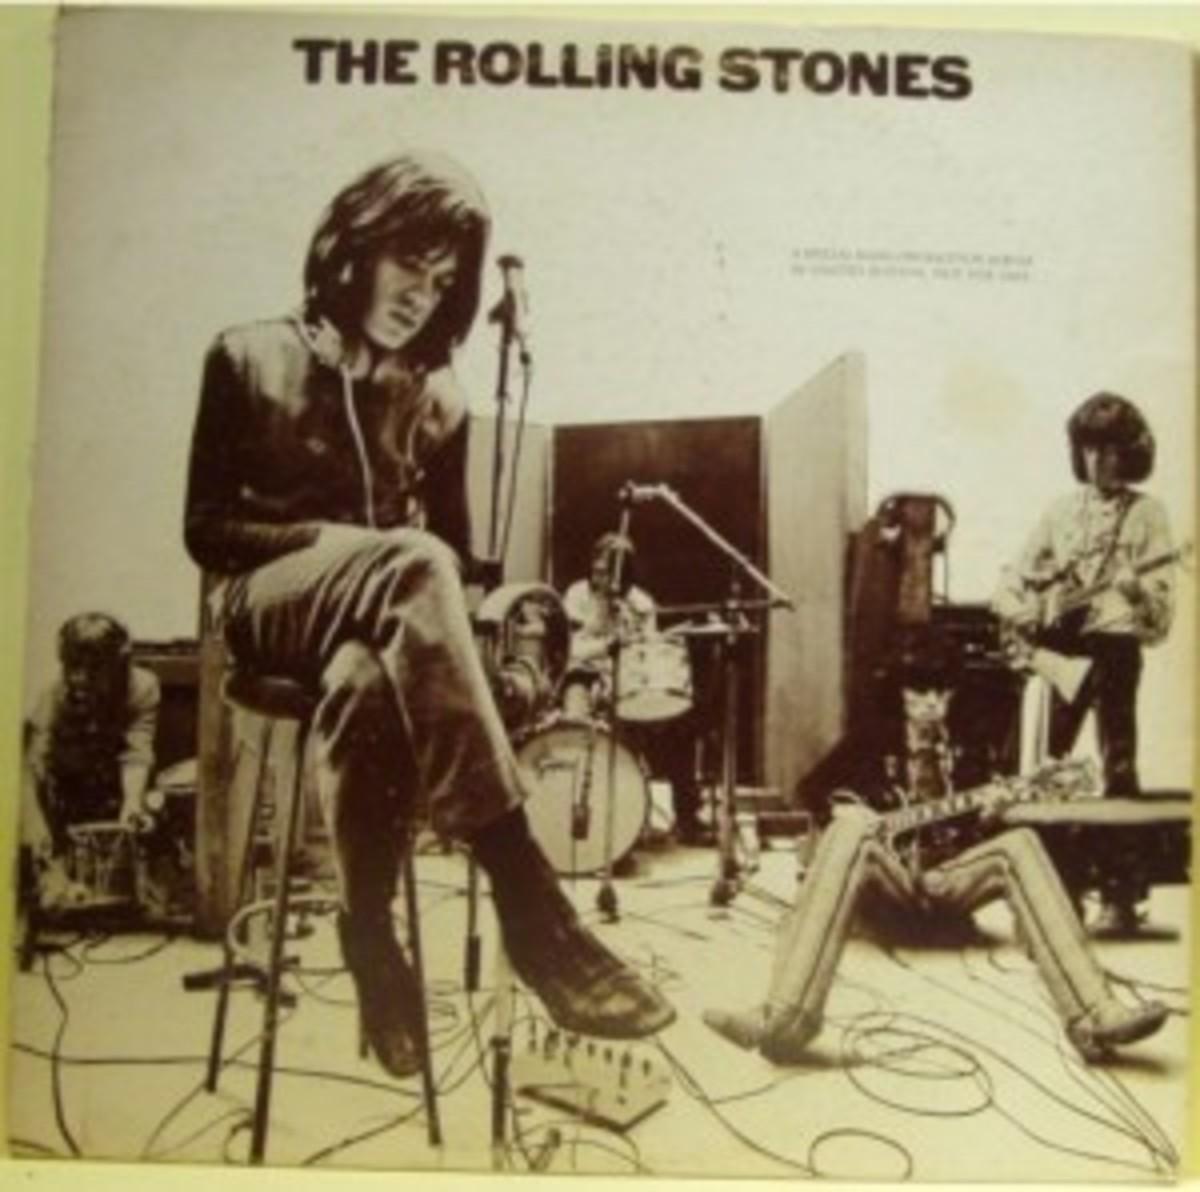 The Rolling Stones autographed promo album